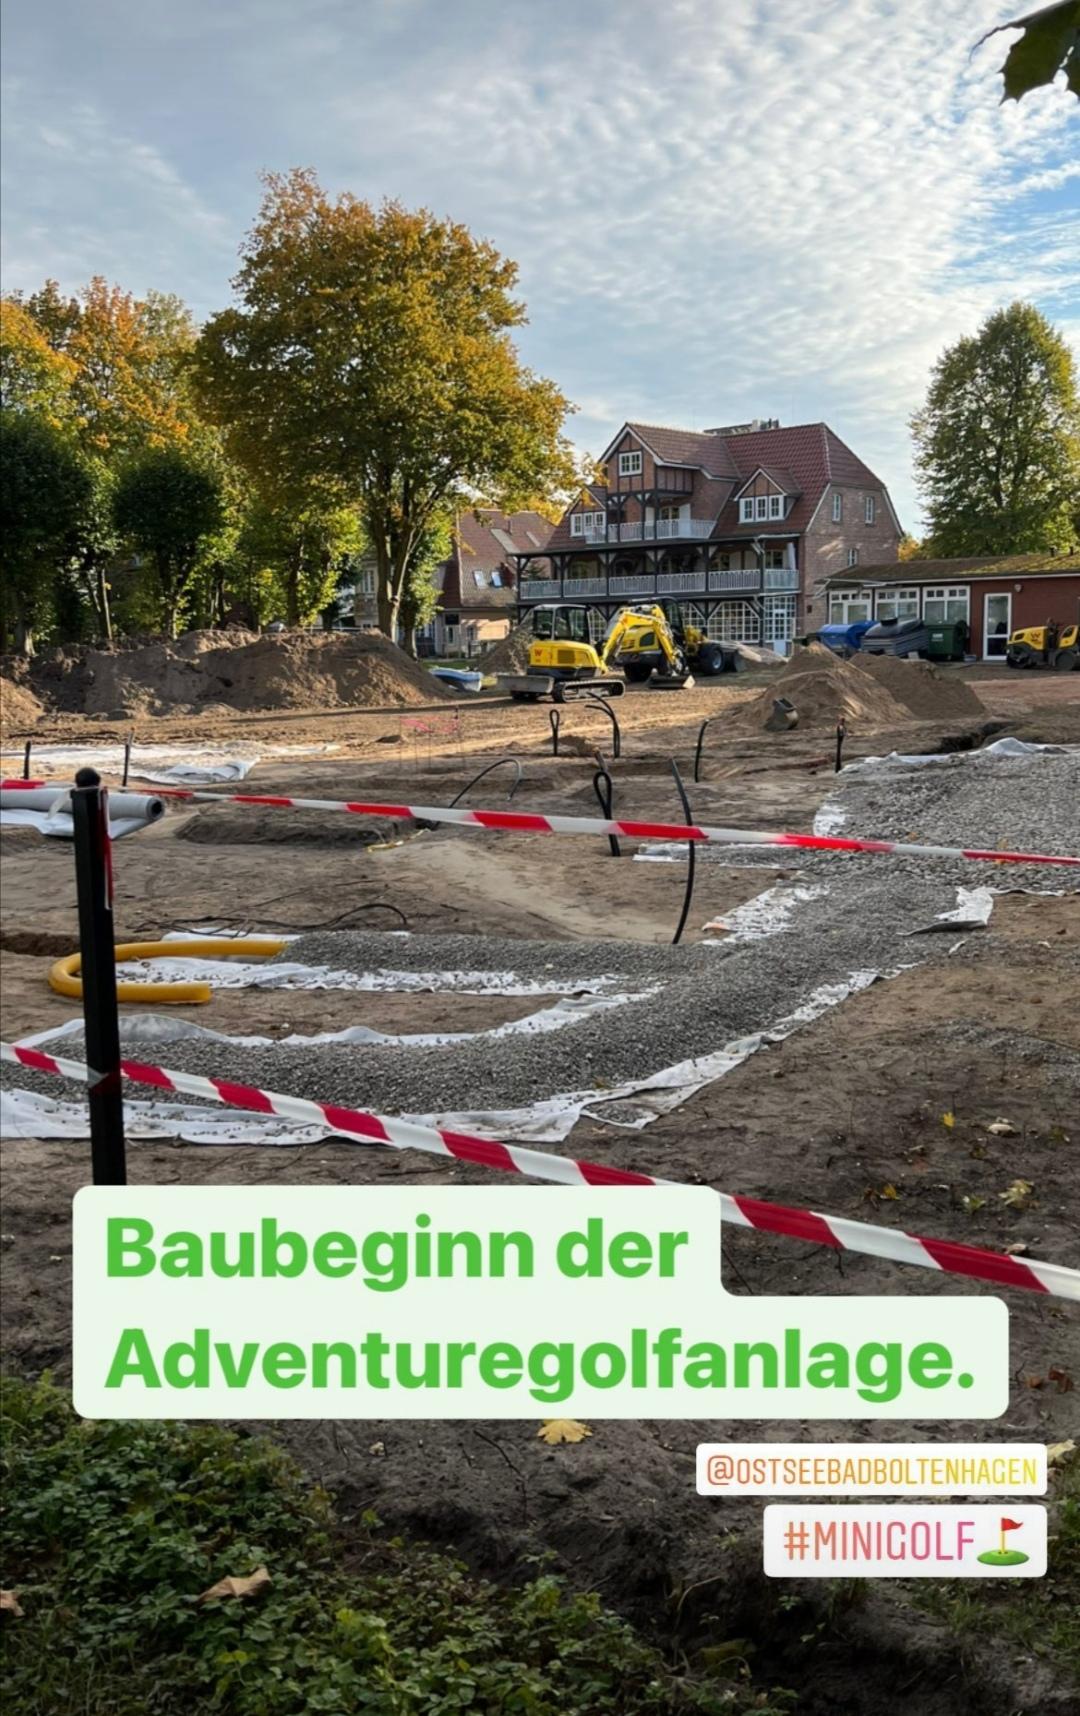 Baubeginn des Adventure Golfpark unter Camp David-Flagge im Ostseebad Boltenhagen.